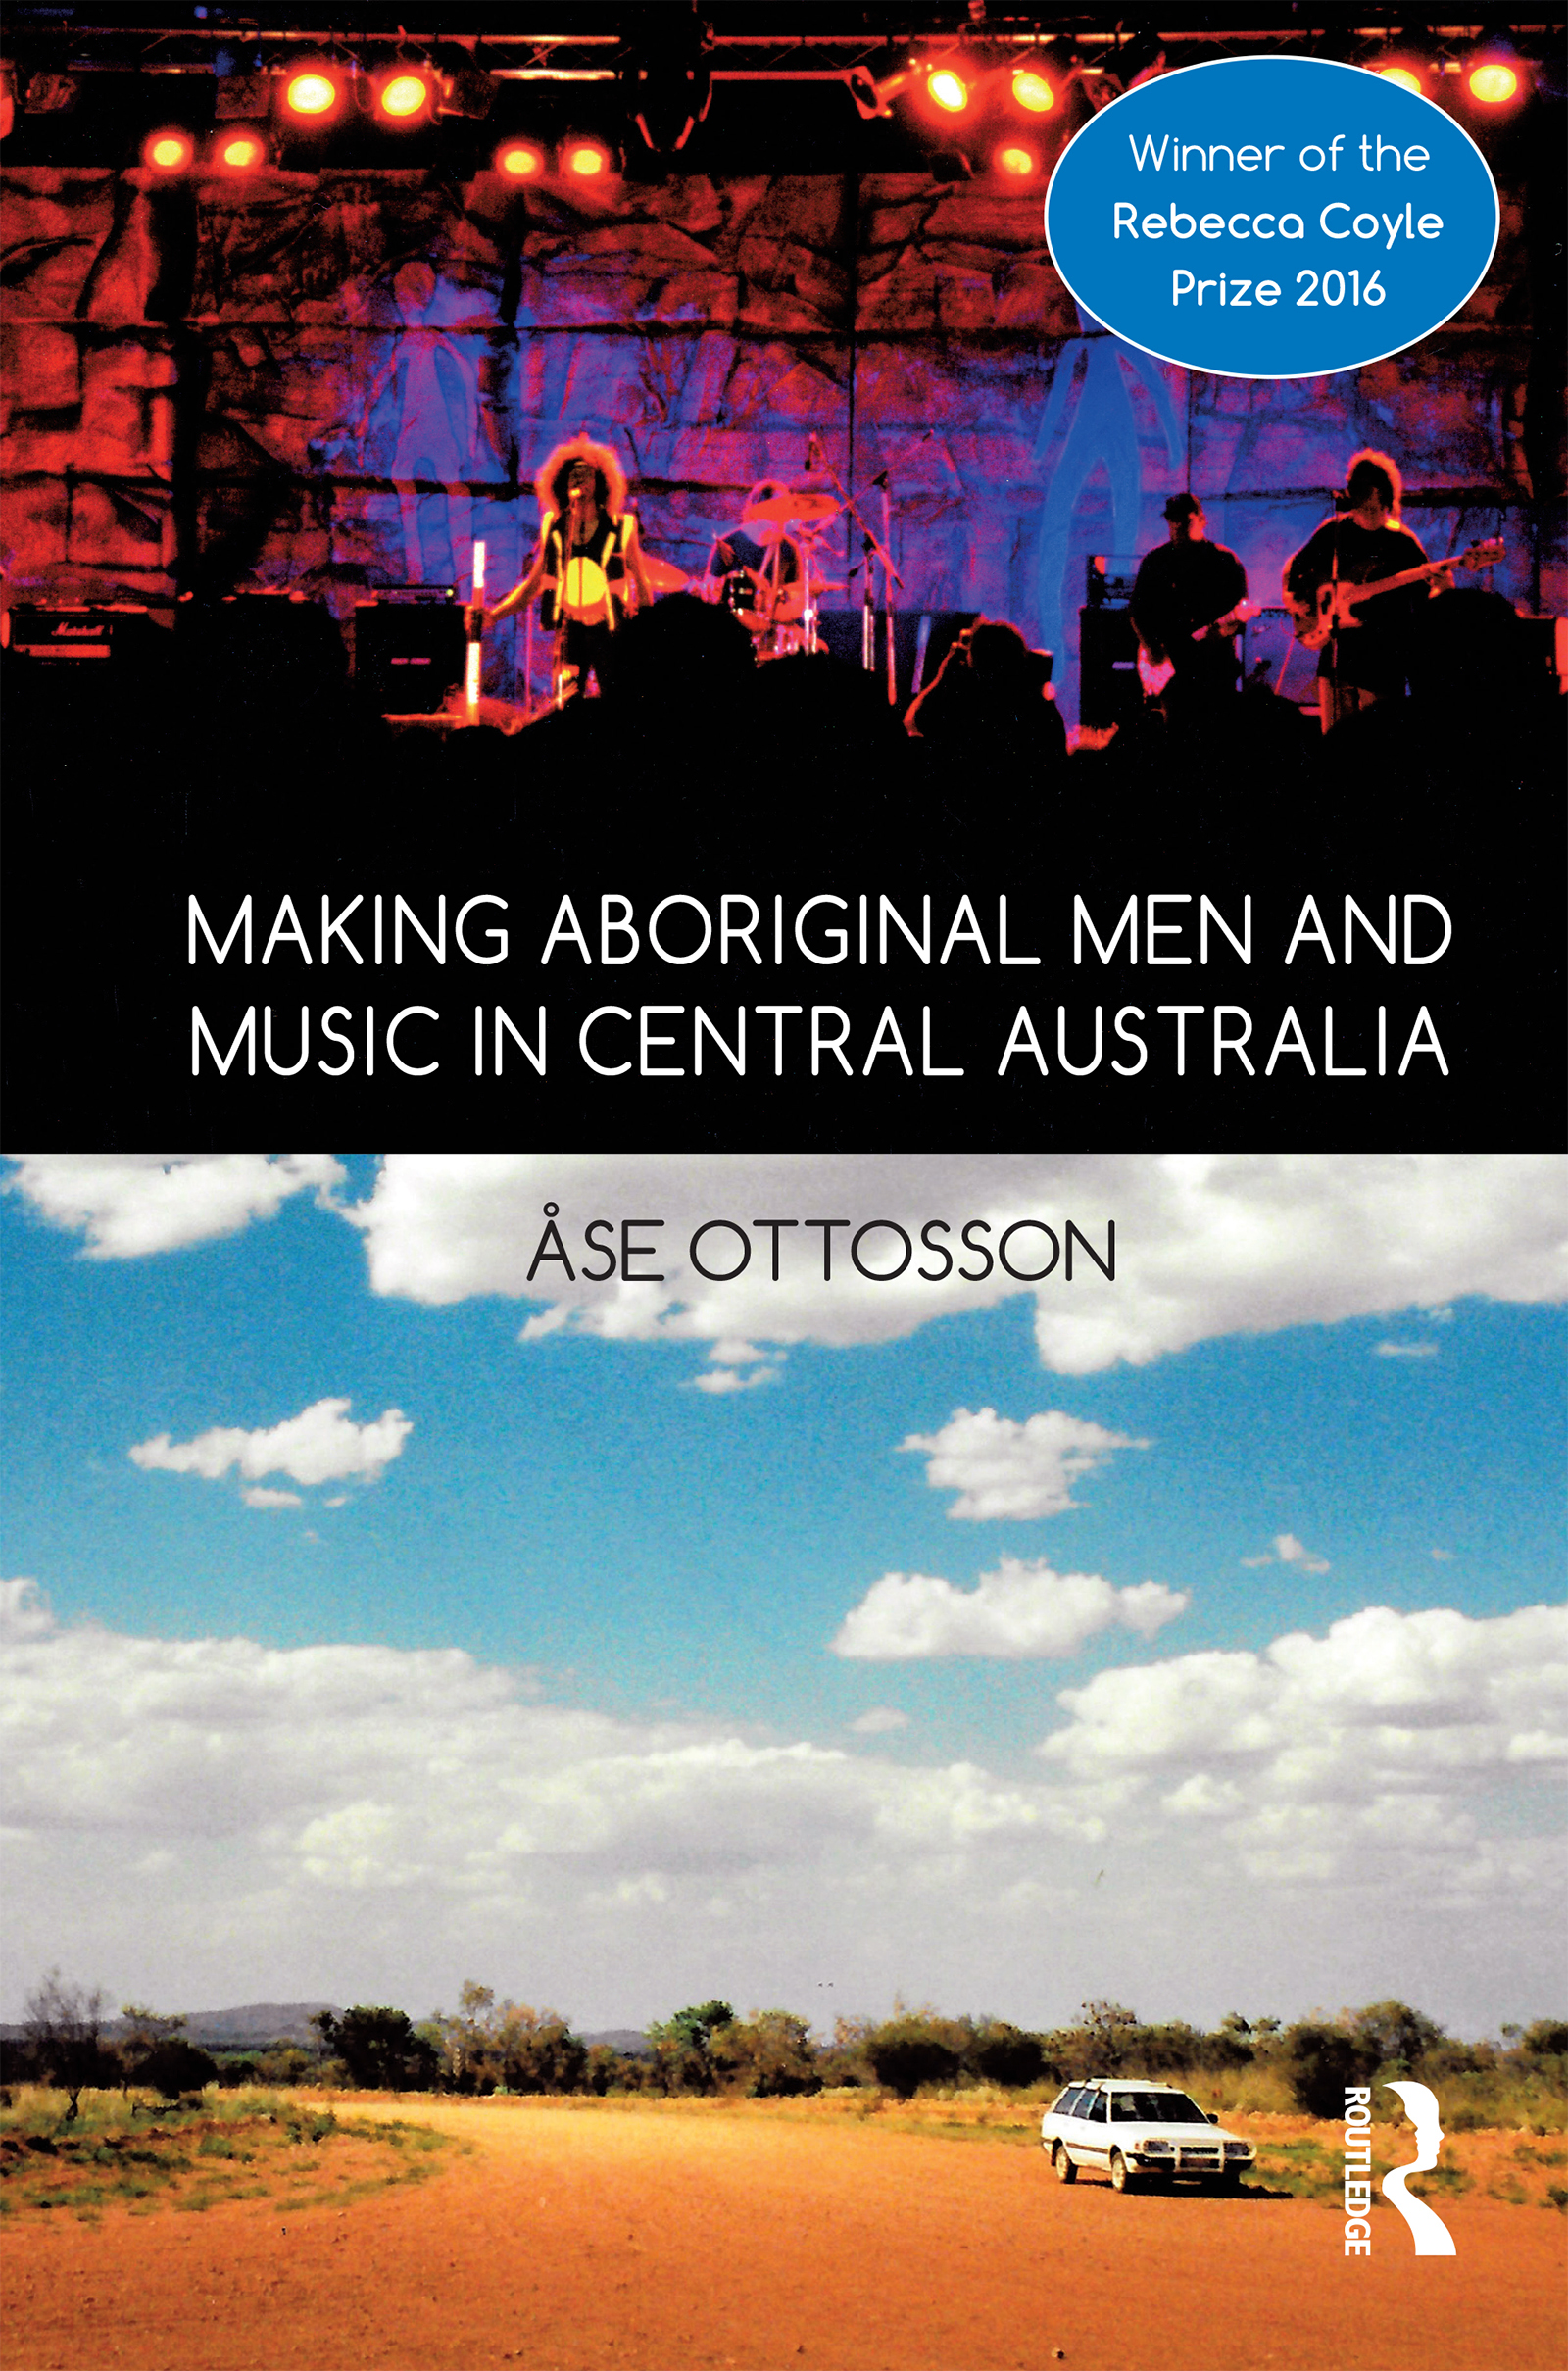 Making Aboriginal Men and Music in Central Australia